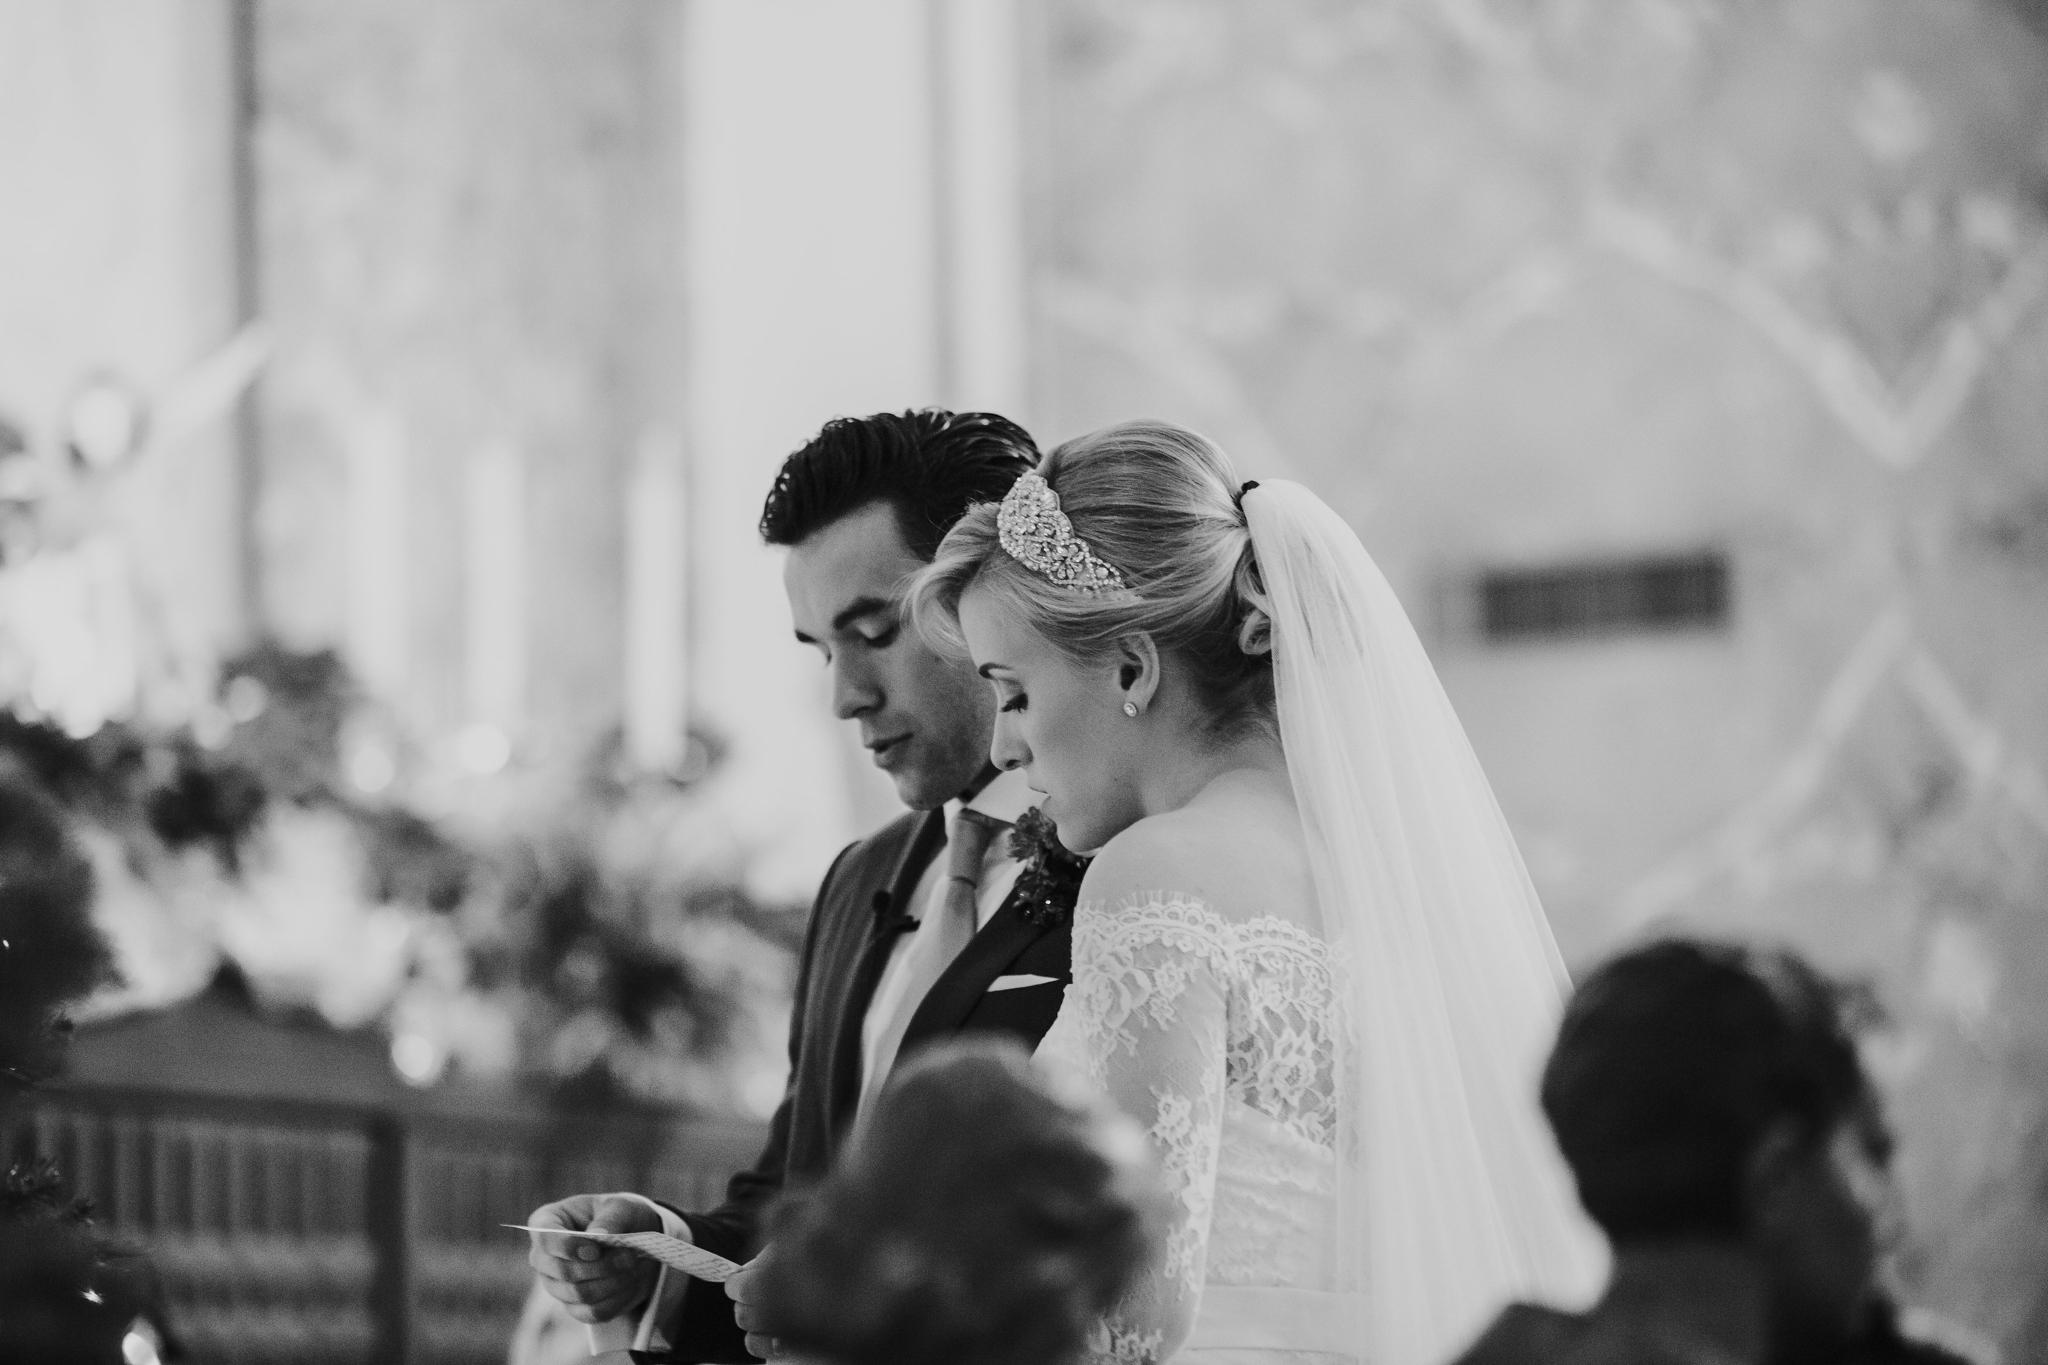 20151230_hussem_wedding_0569_web.jpg